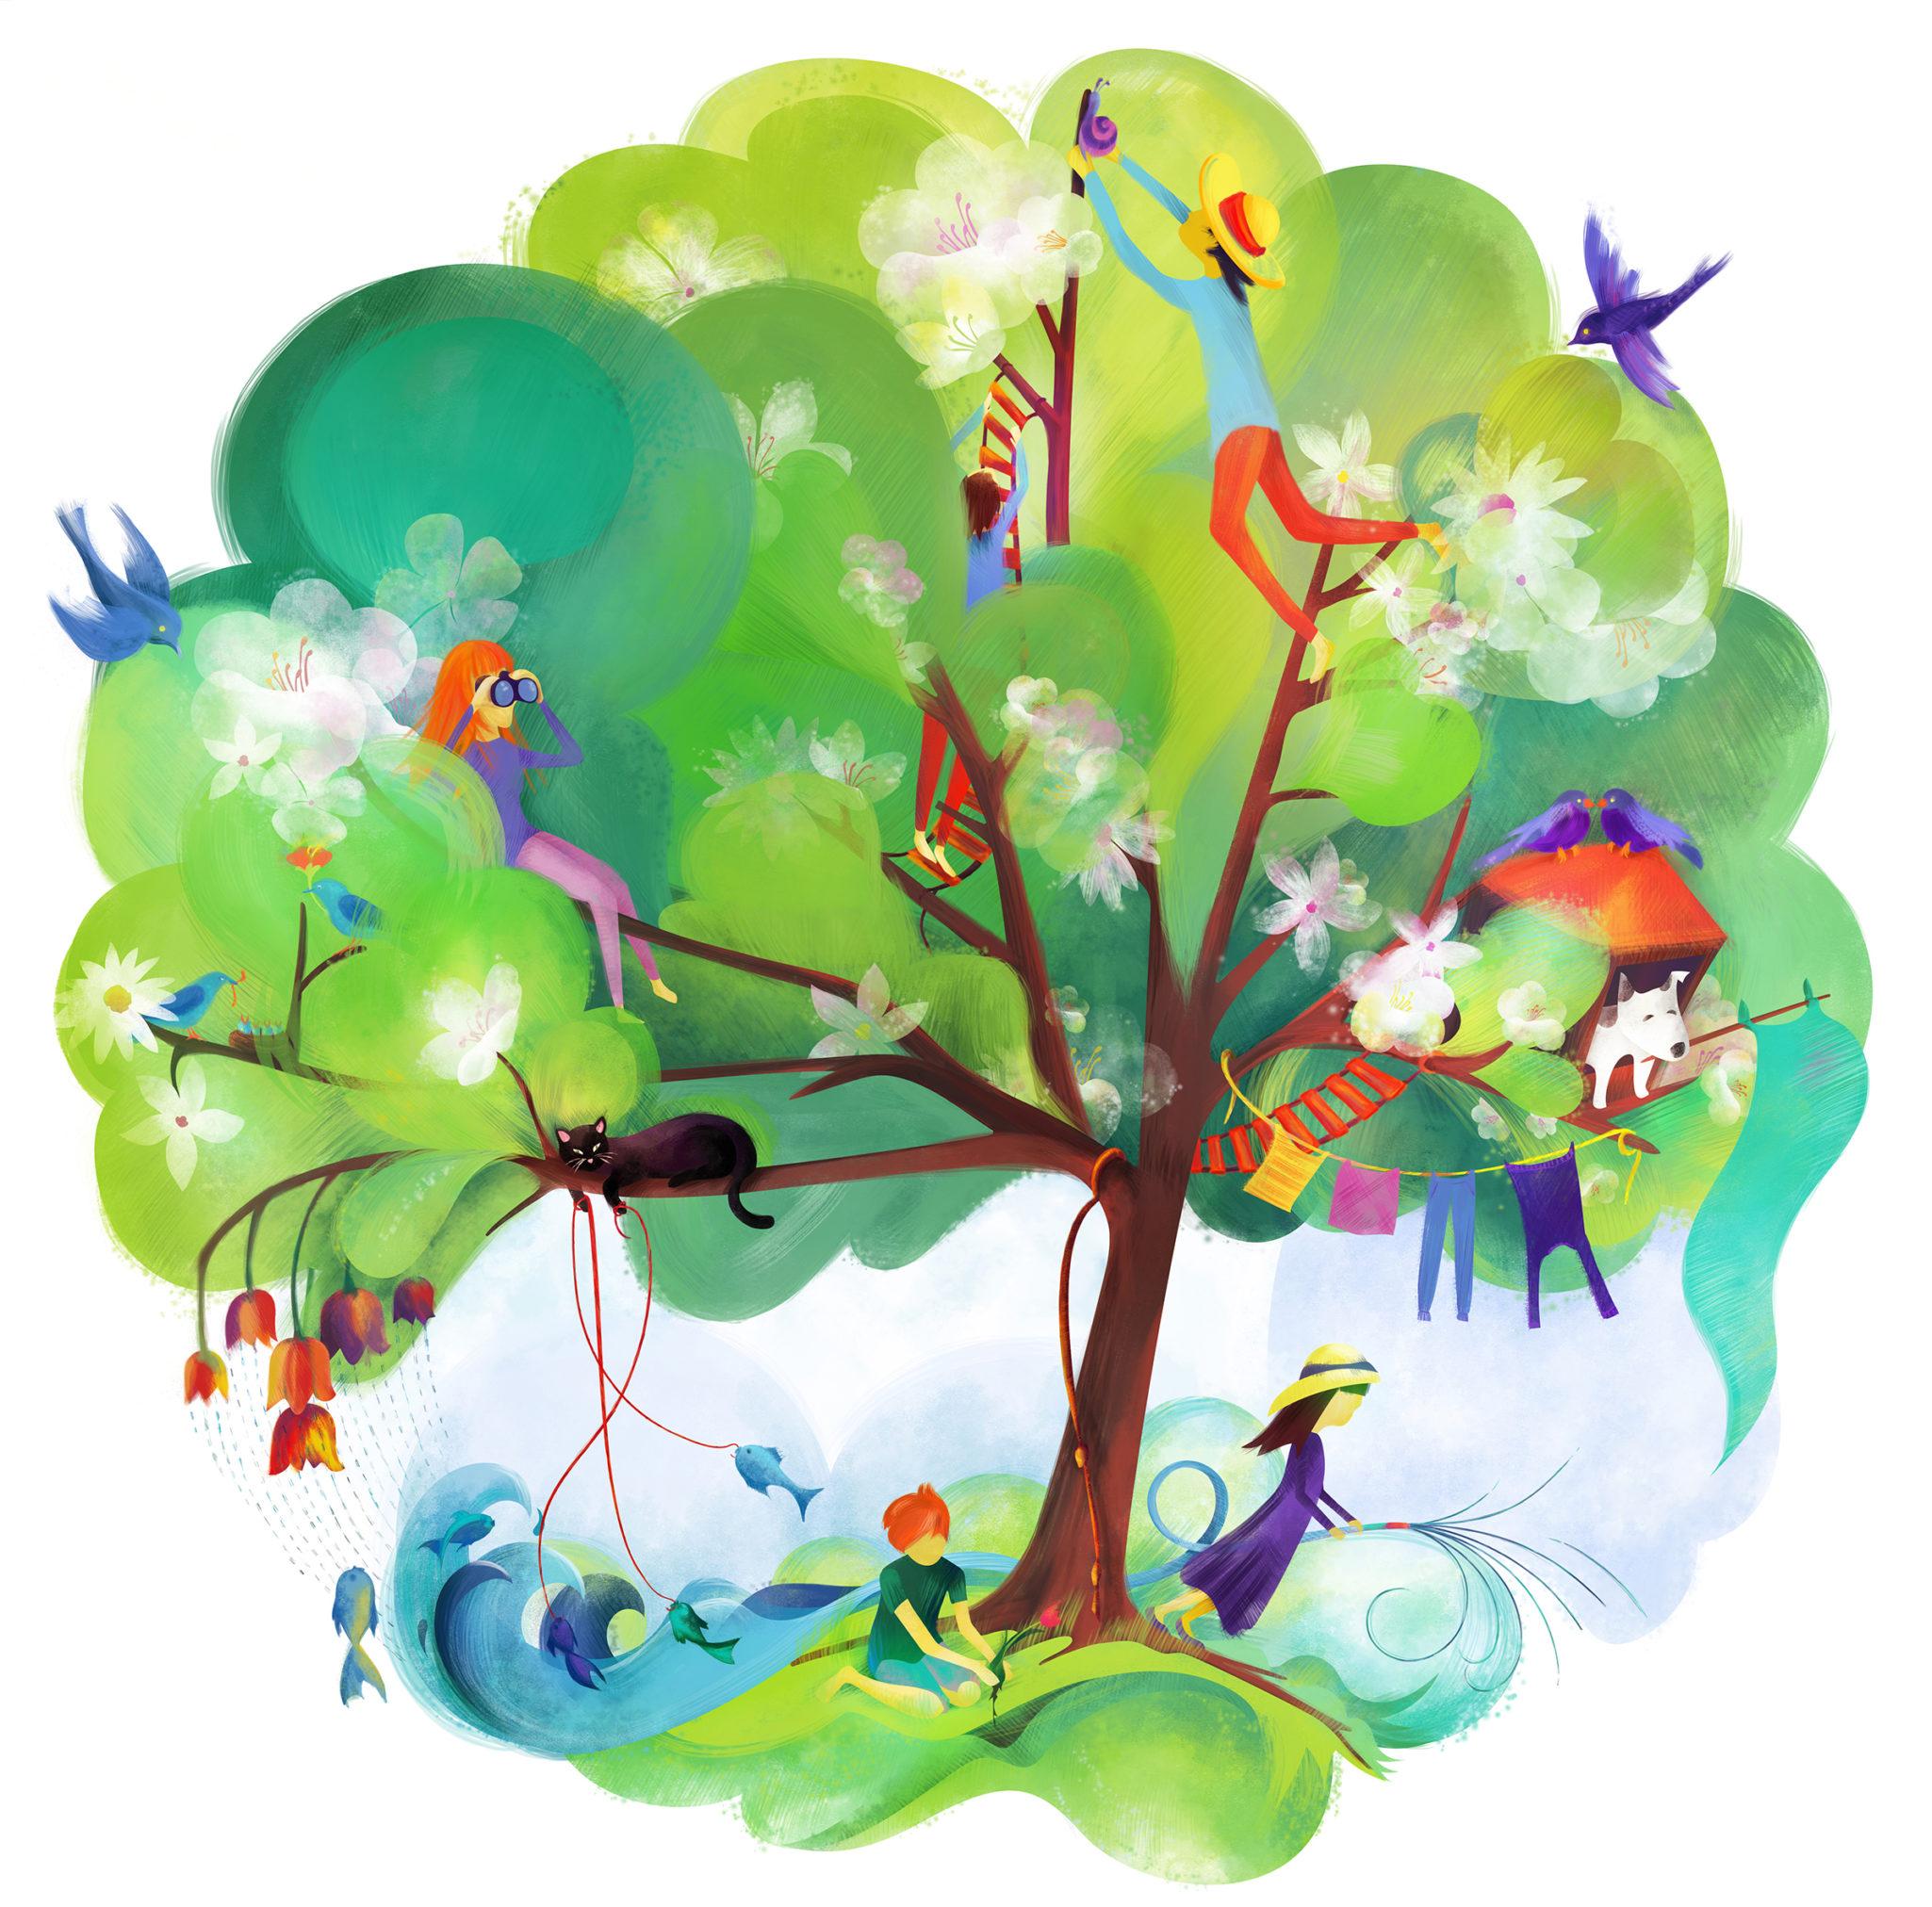 Illustration: Springtree